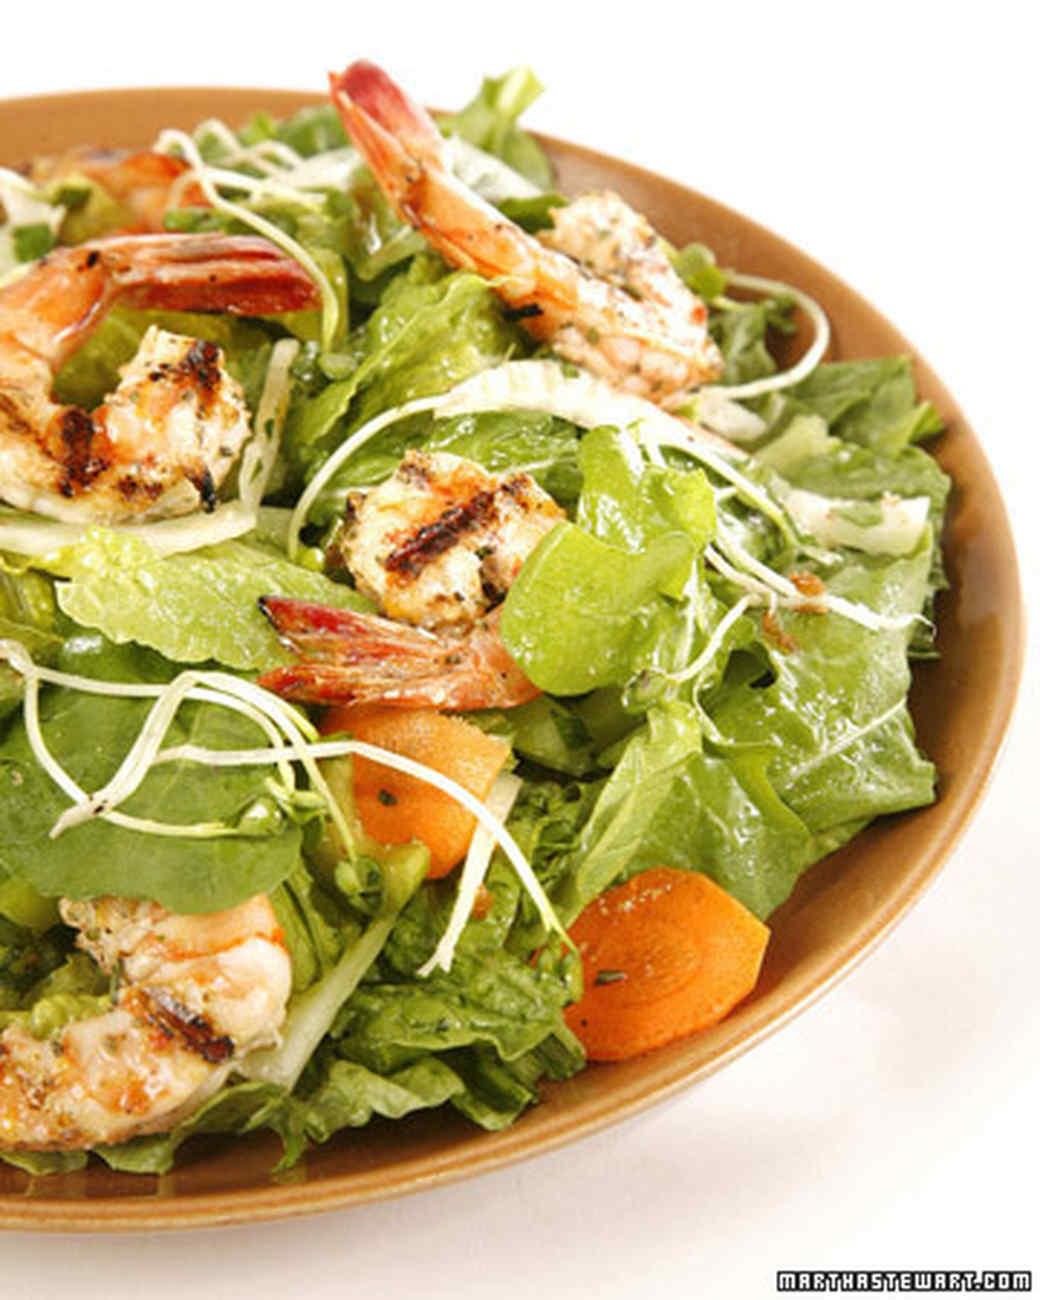 2117_recipe_salad.jpg